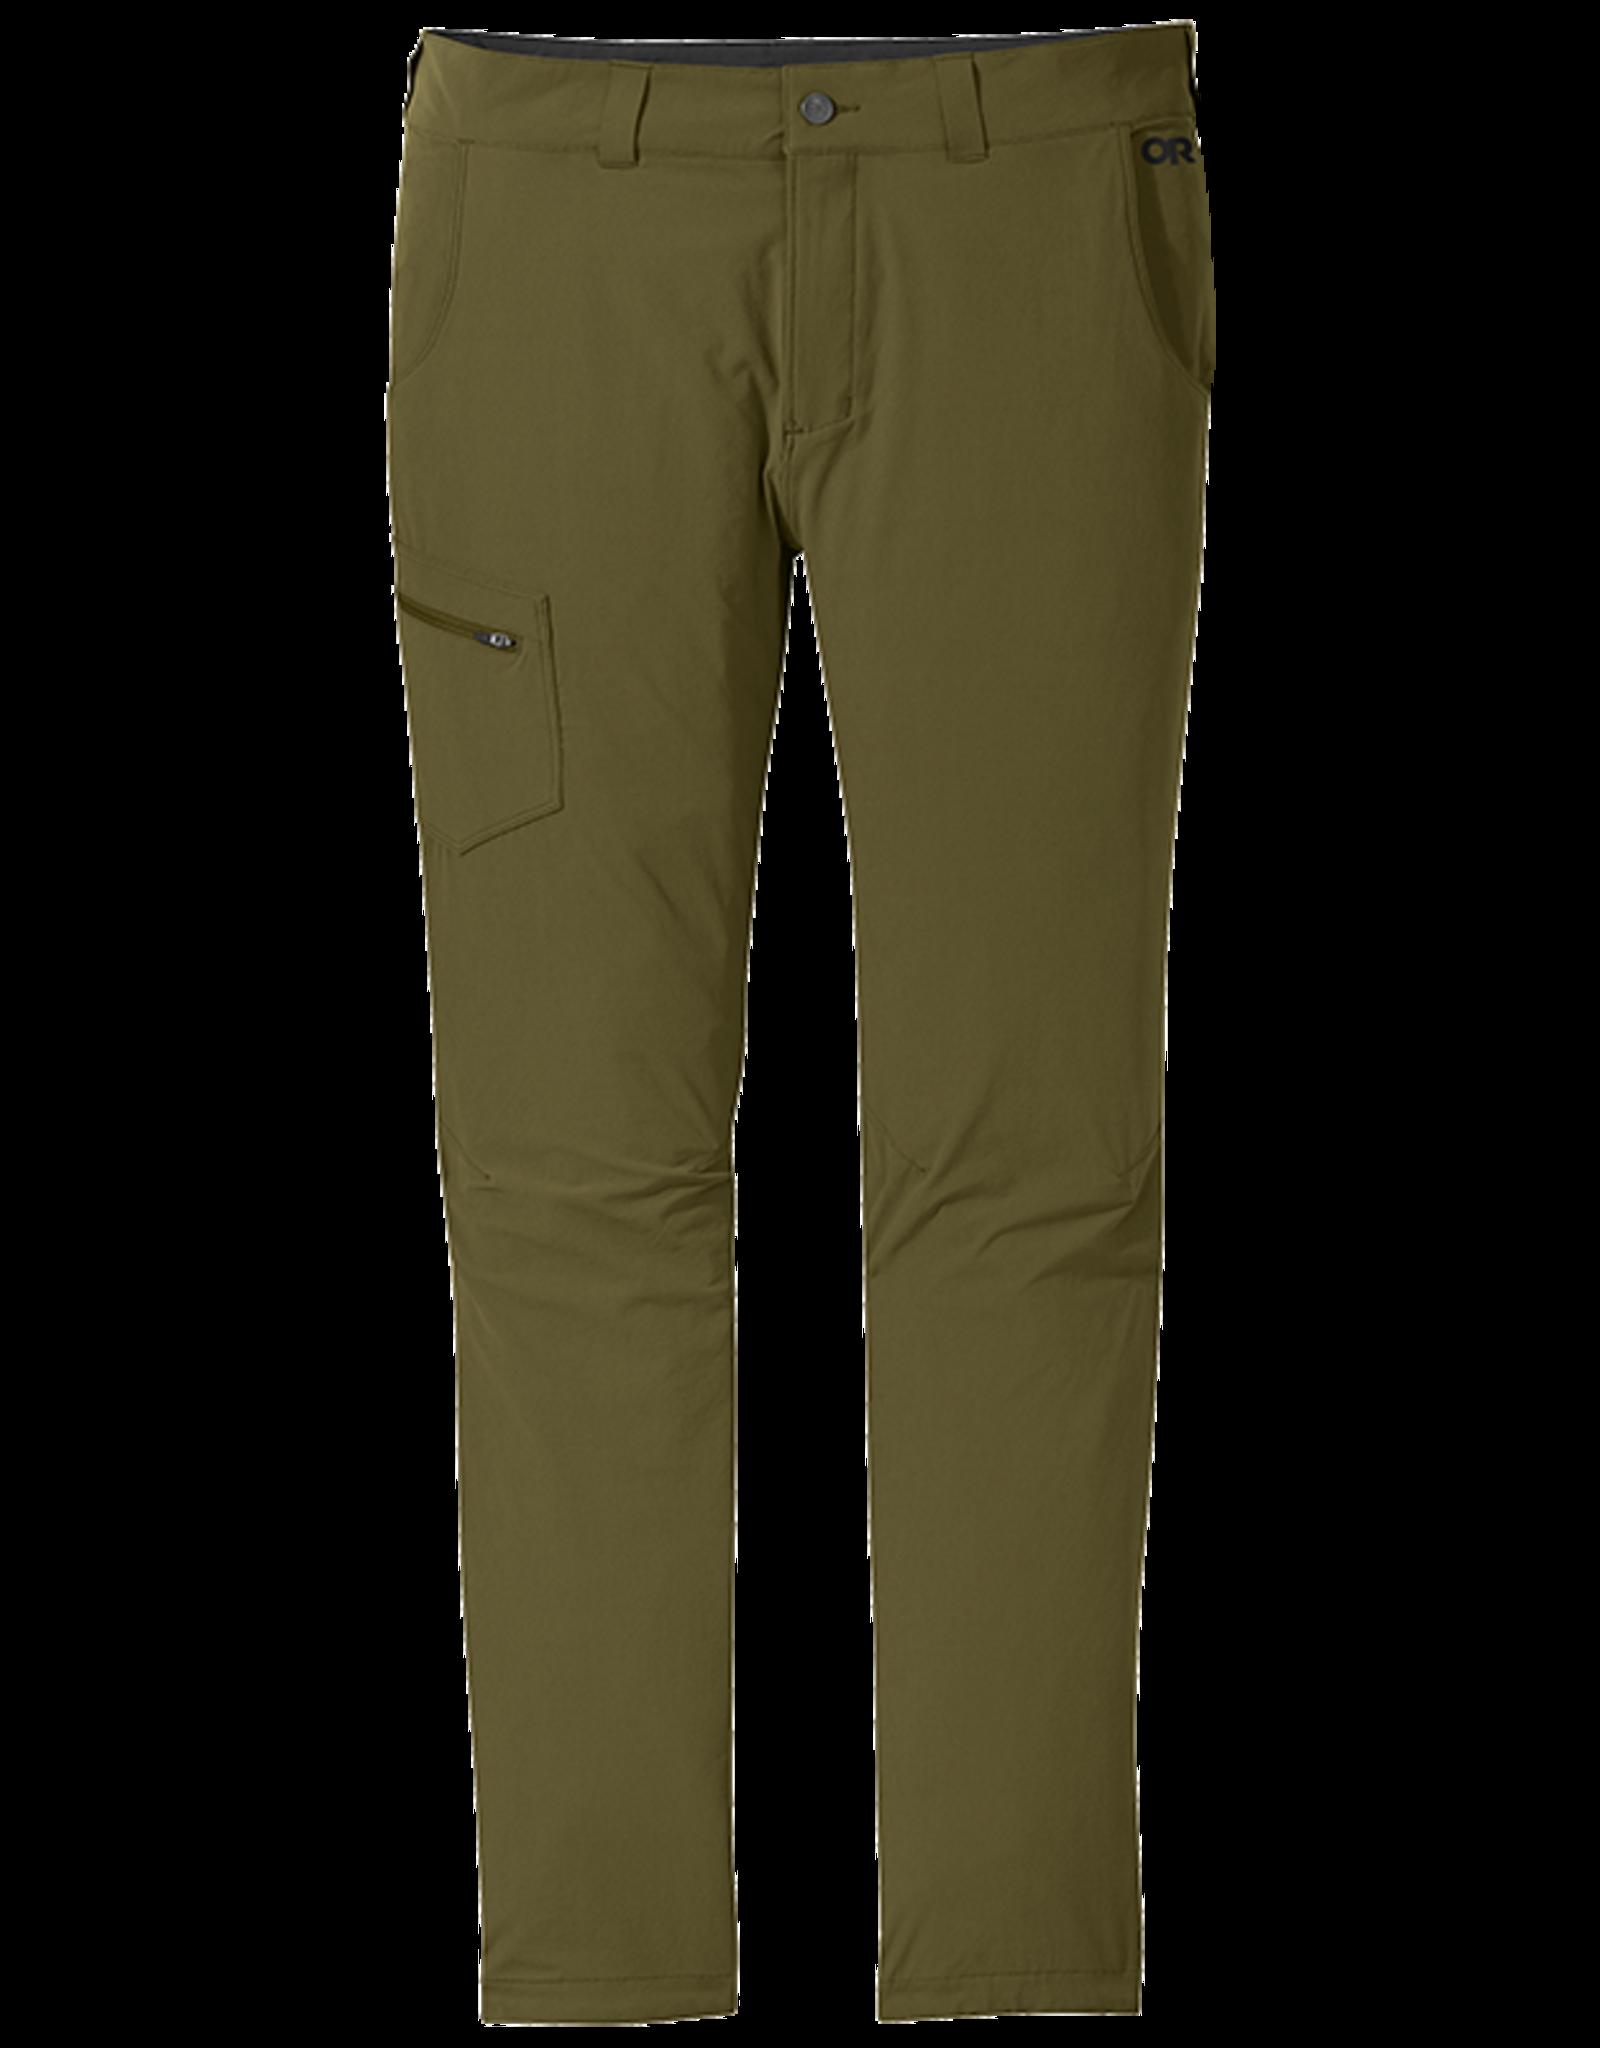 Outdoor Research Outdoor Research Ferrosi Pants Men's